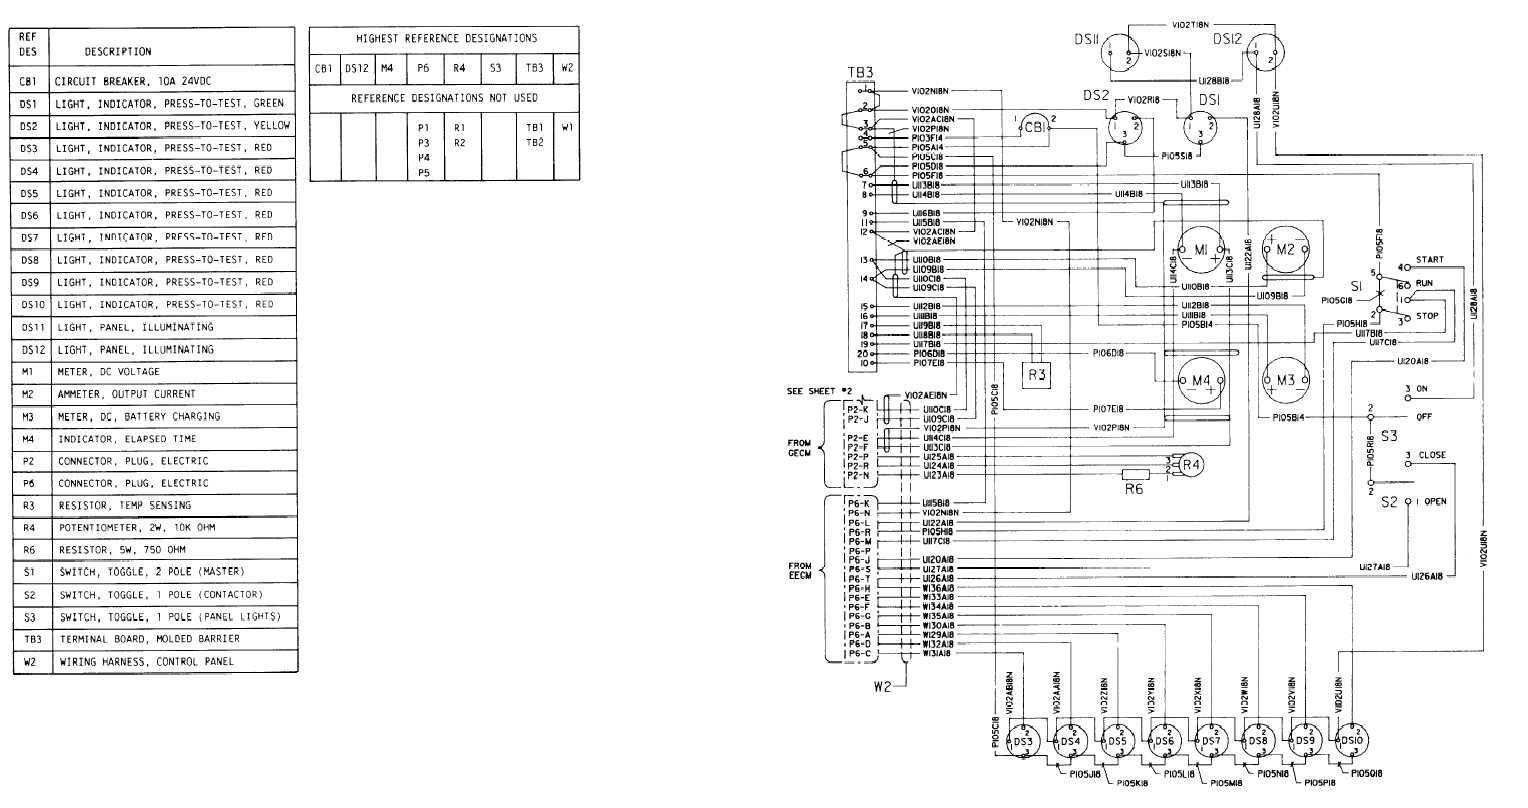 Electrical Control Panel Wiring Diagram Pdf